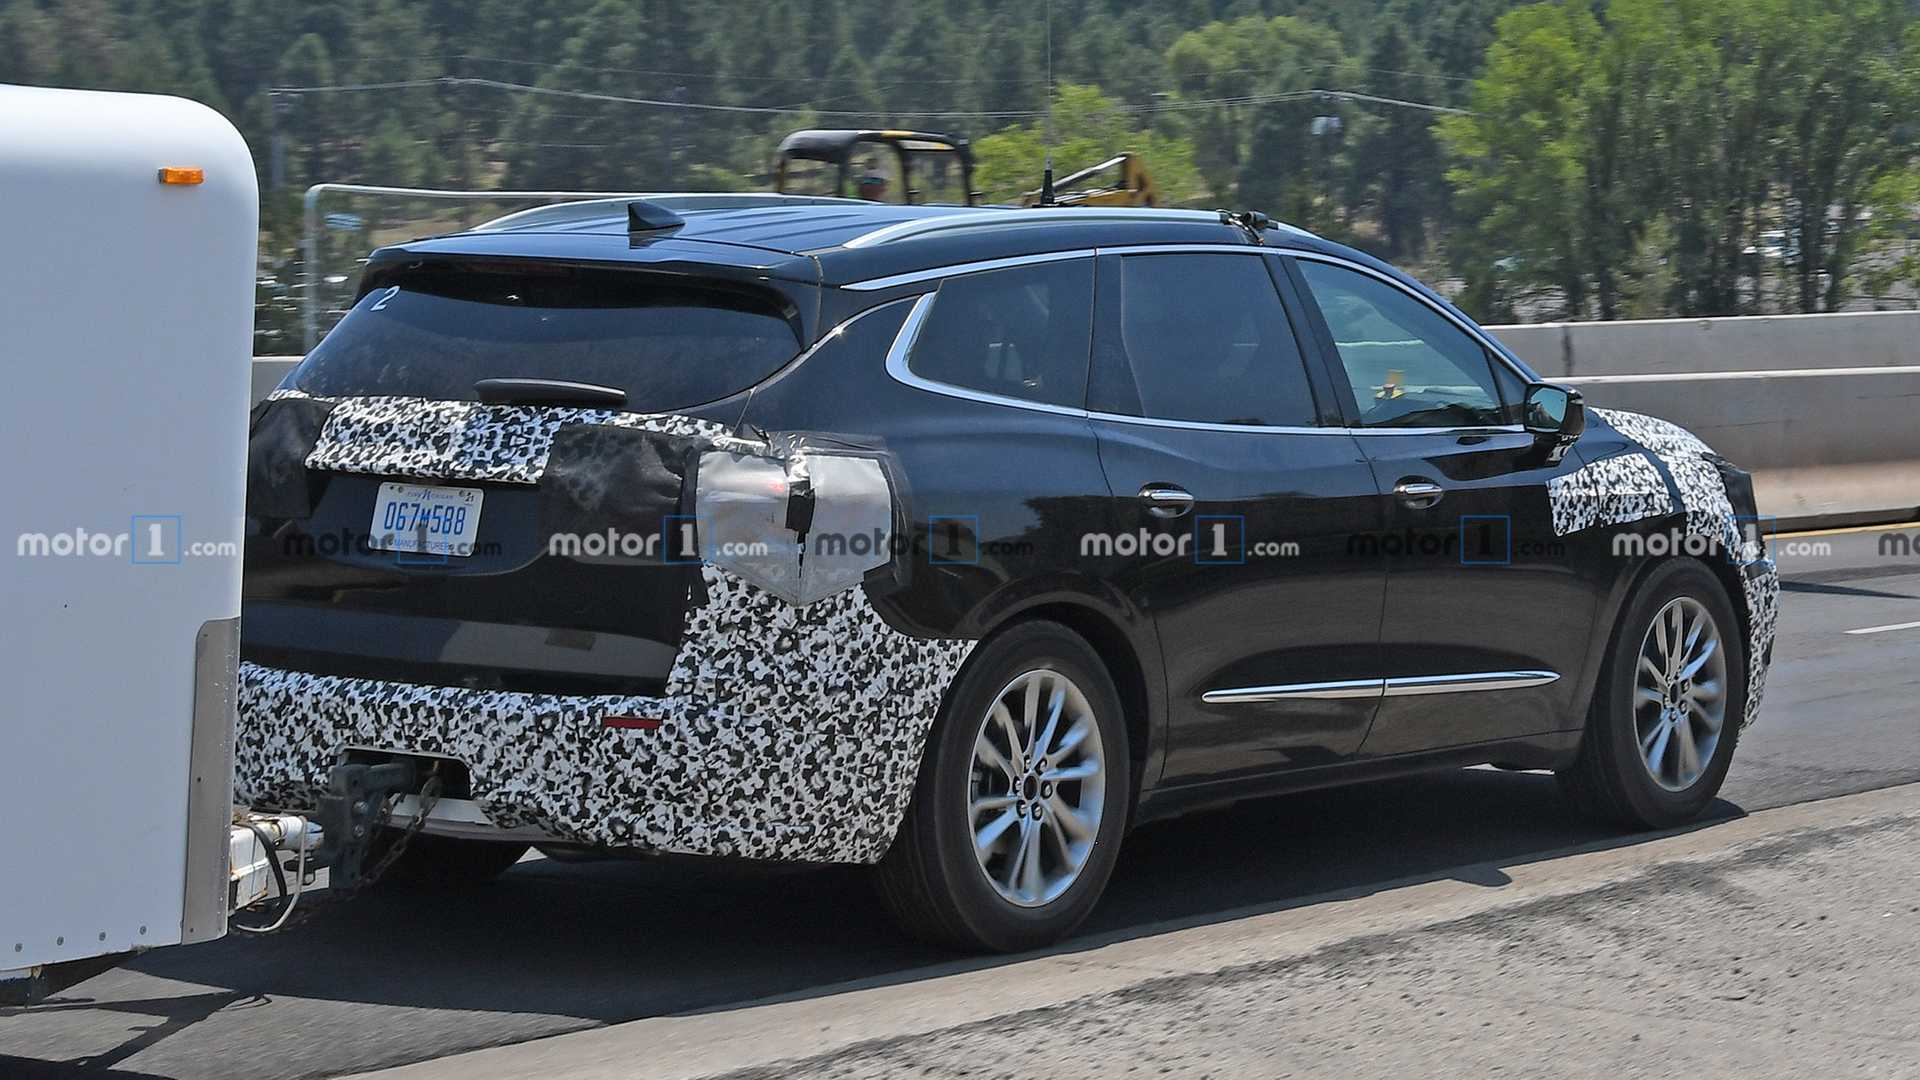 2021 Buick Enclave Spy Photos Speed Test